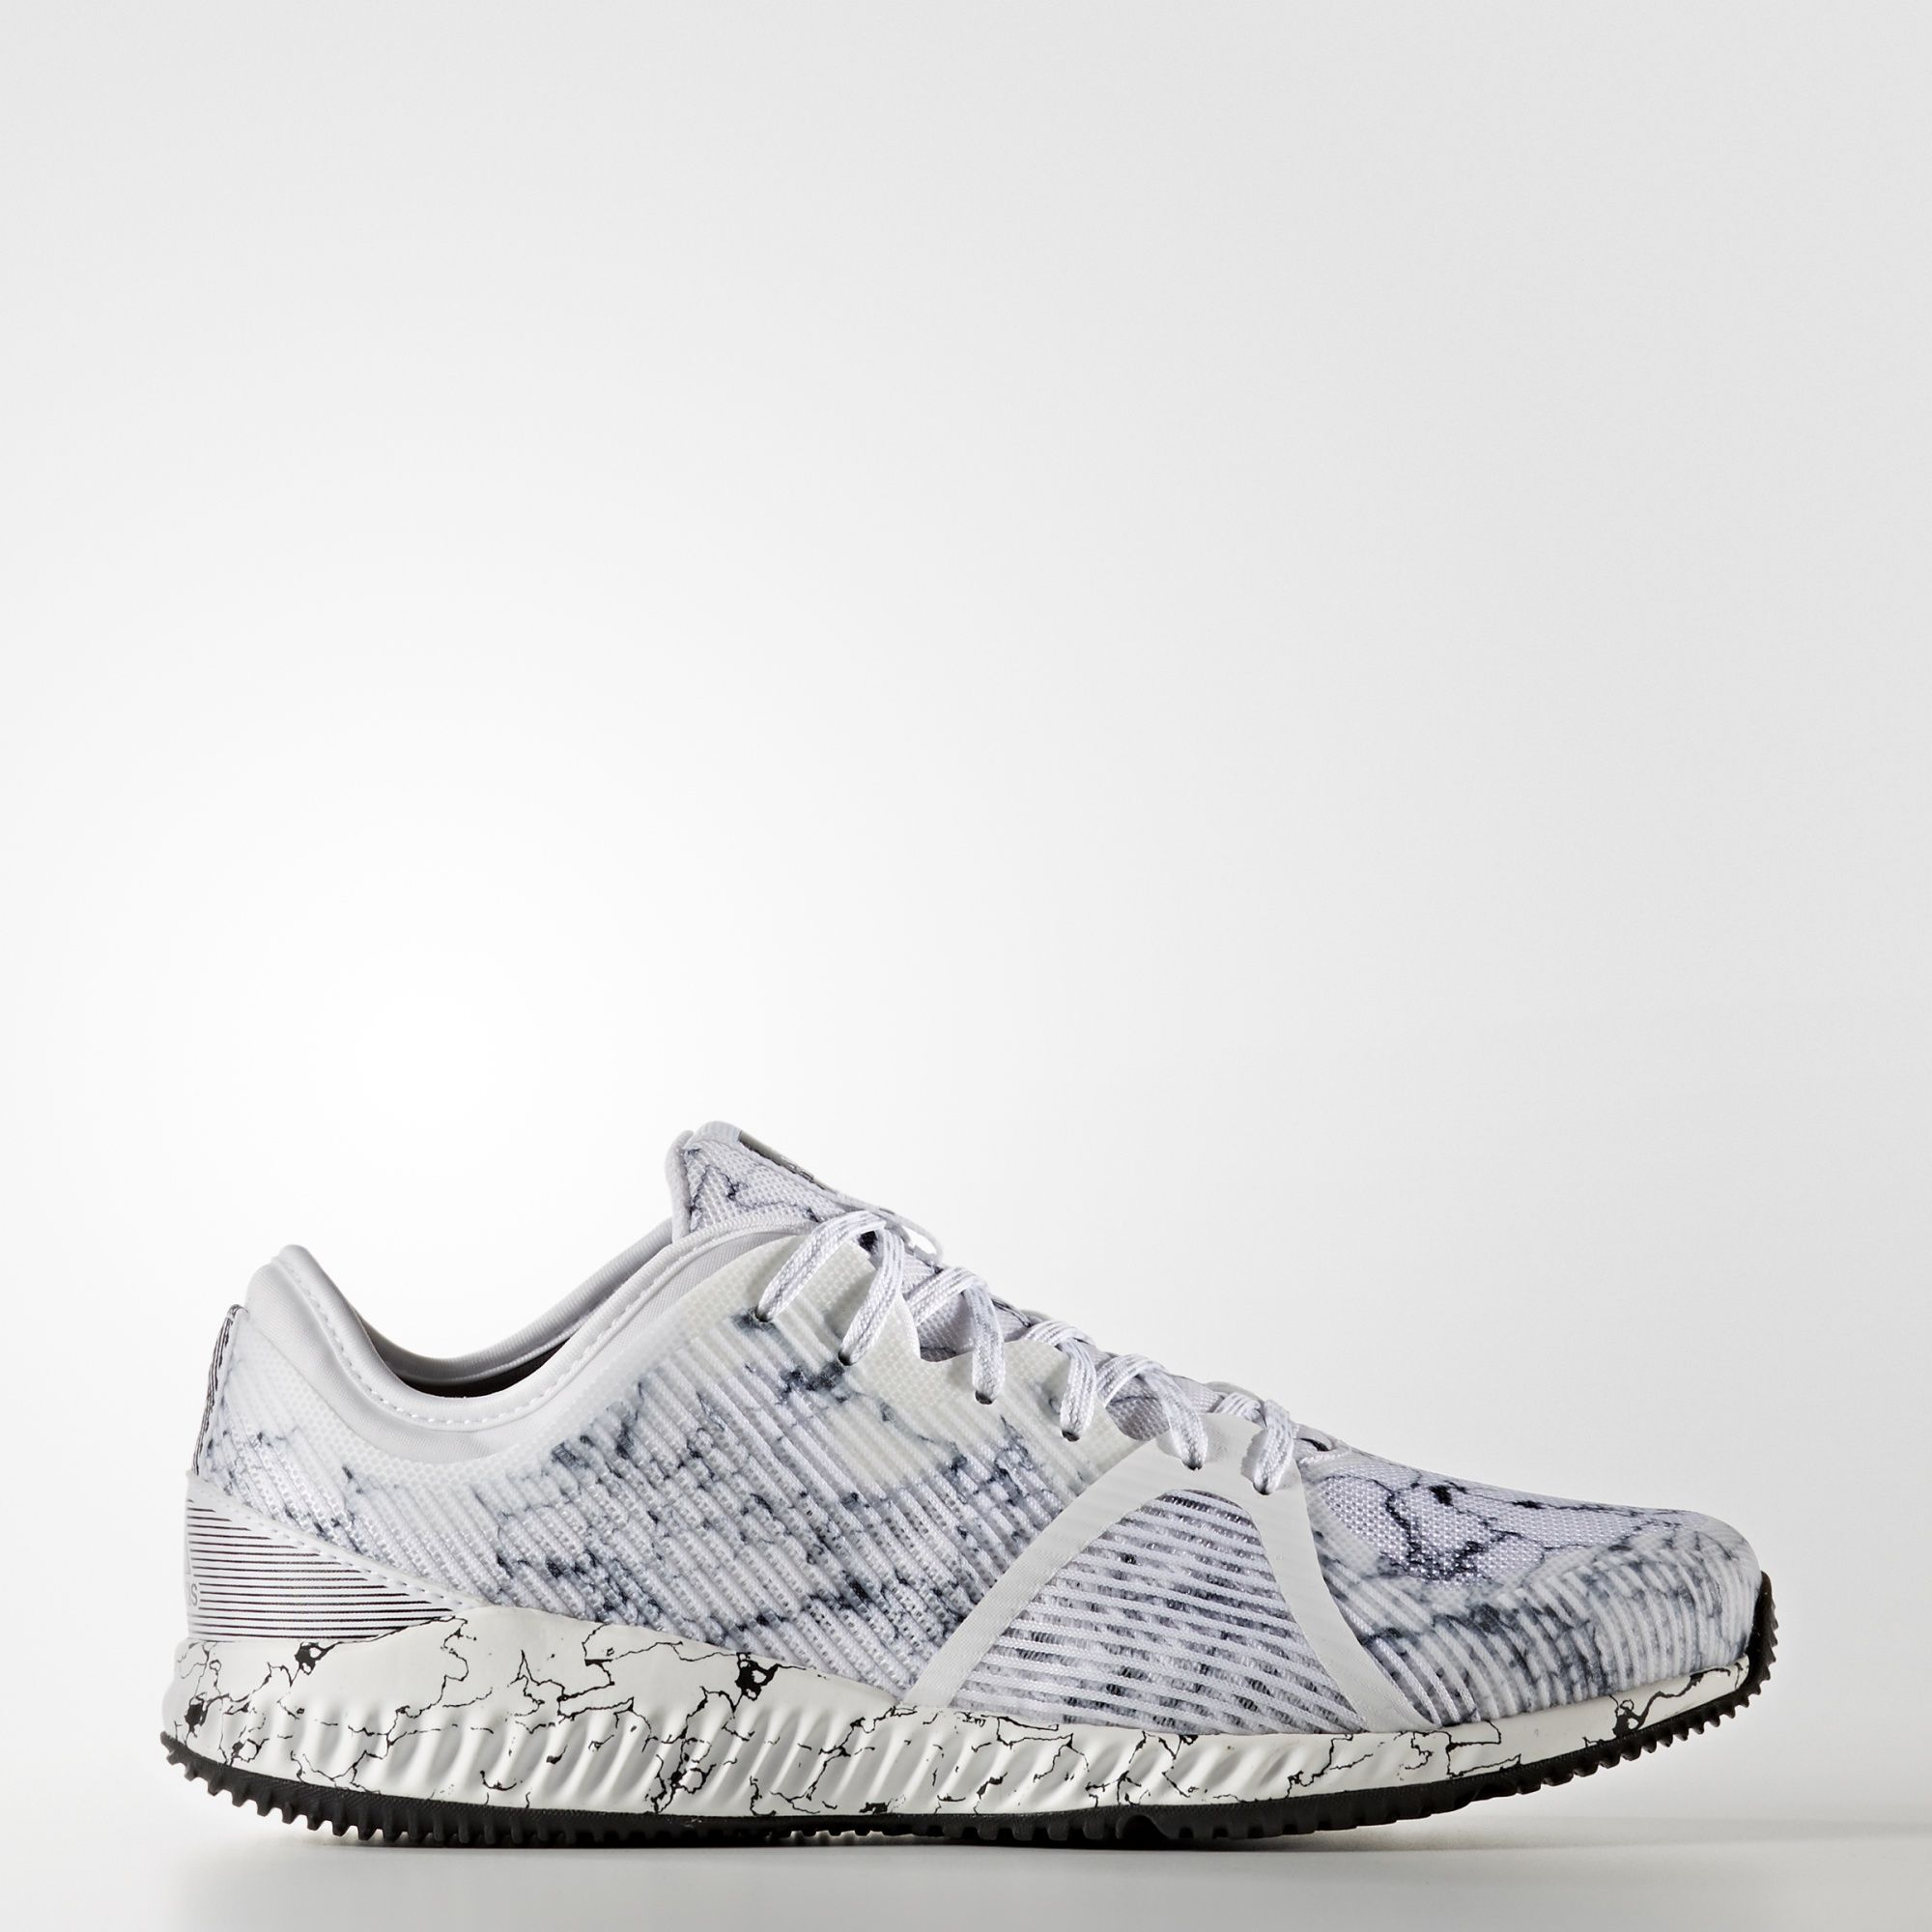 adidas Crazy Train Sneakers nCGwcGPM